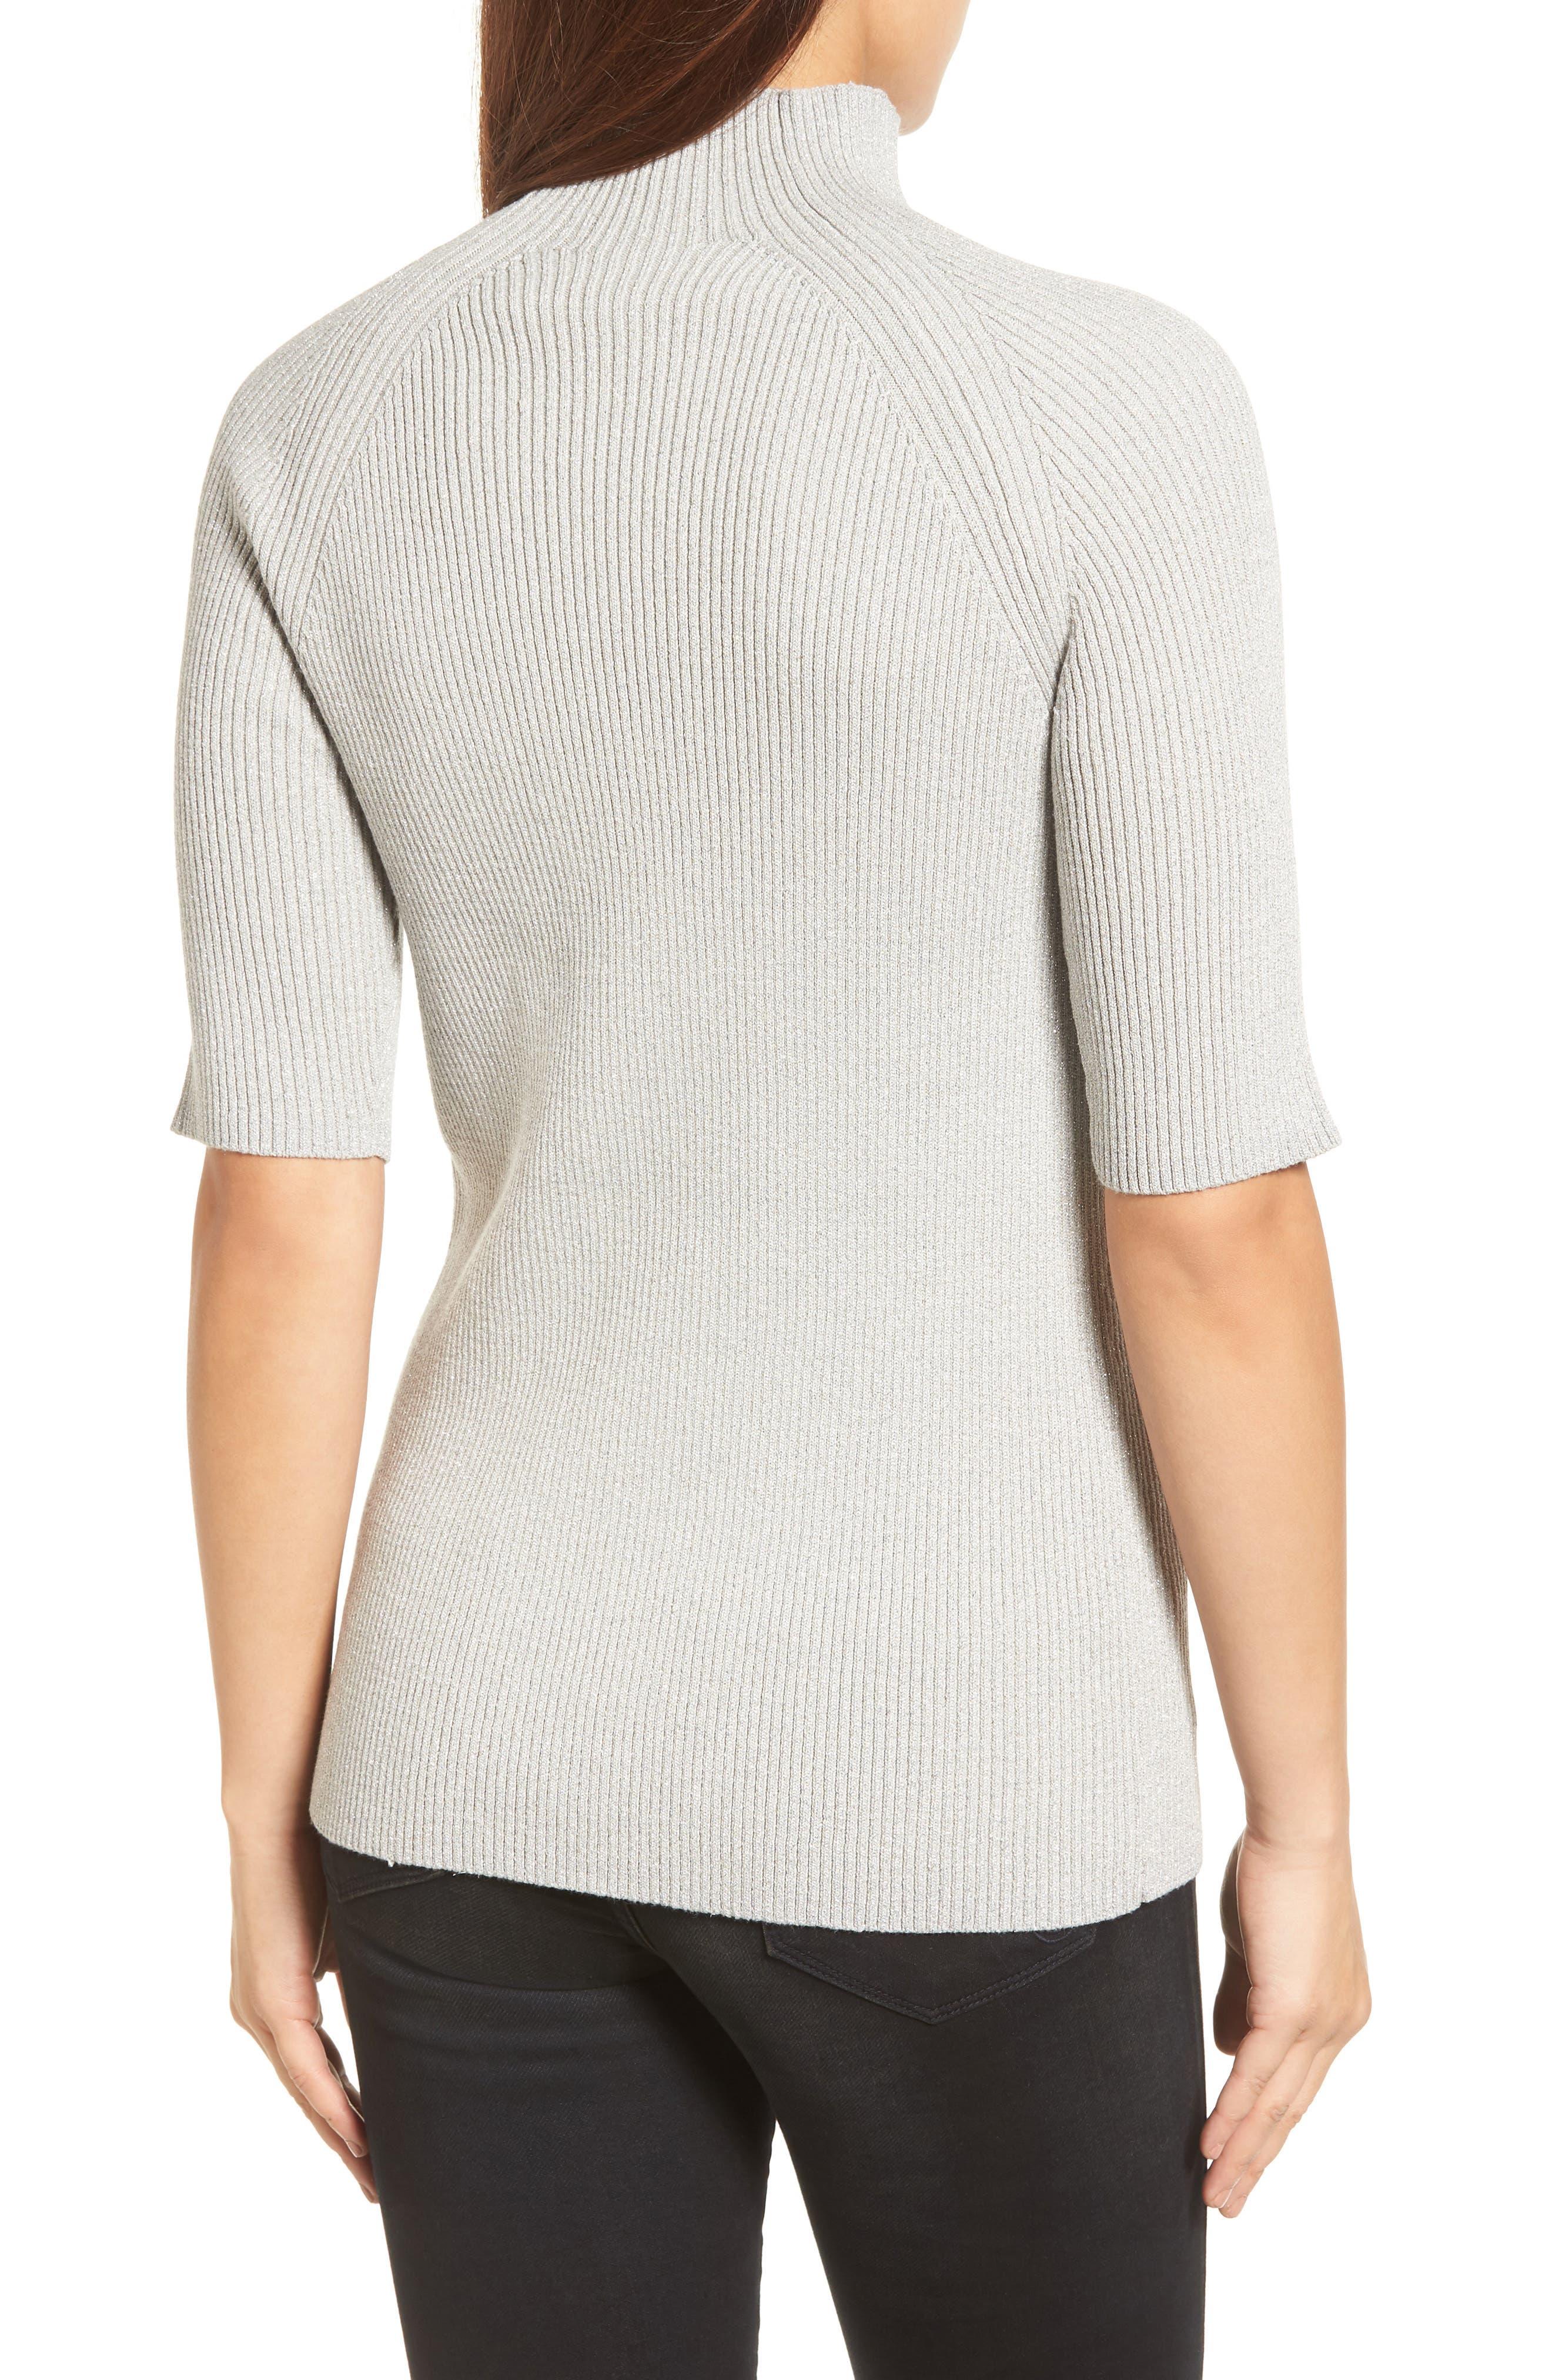 Elbow Sleeve Mock Neck Sweater,                             Alternate thumbnail 2, color,                             LIGHT GRAY